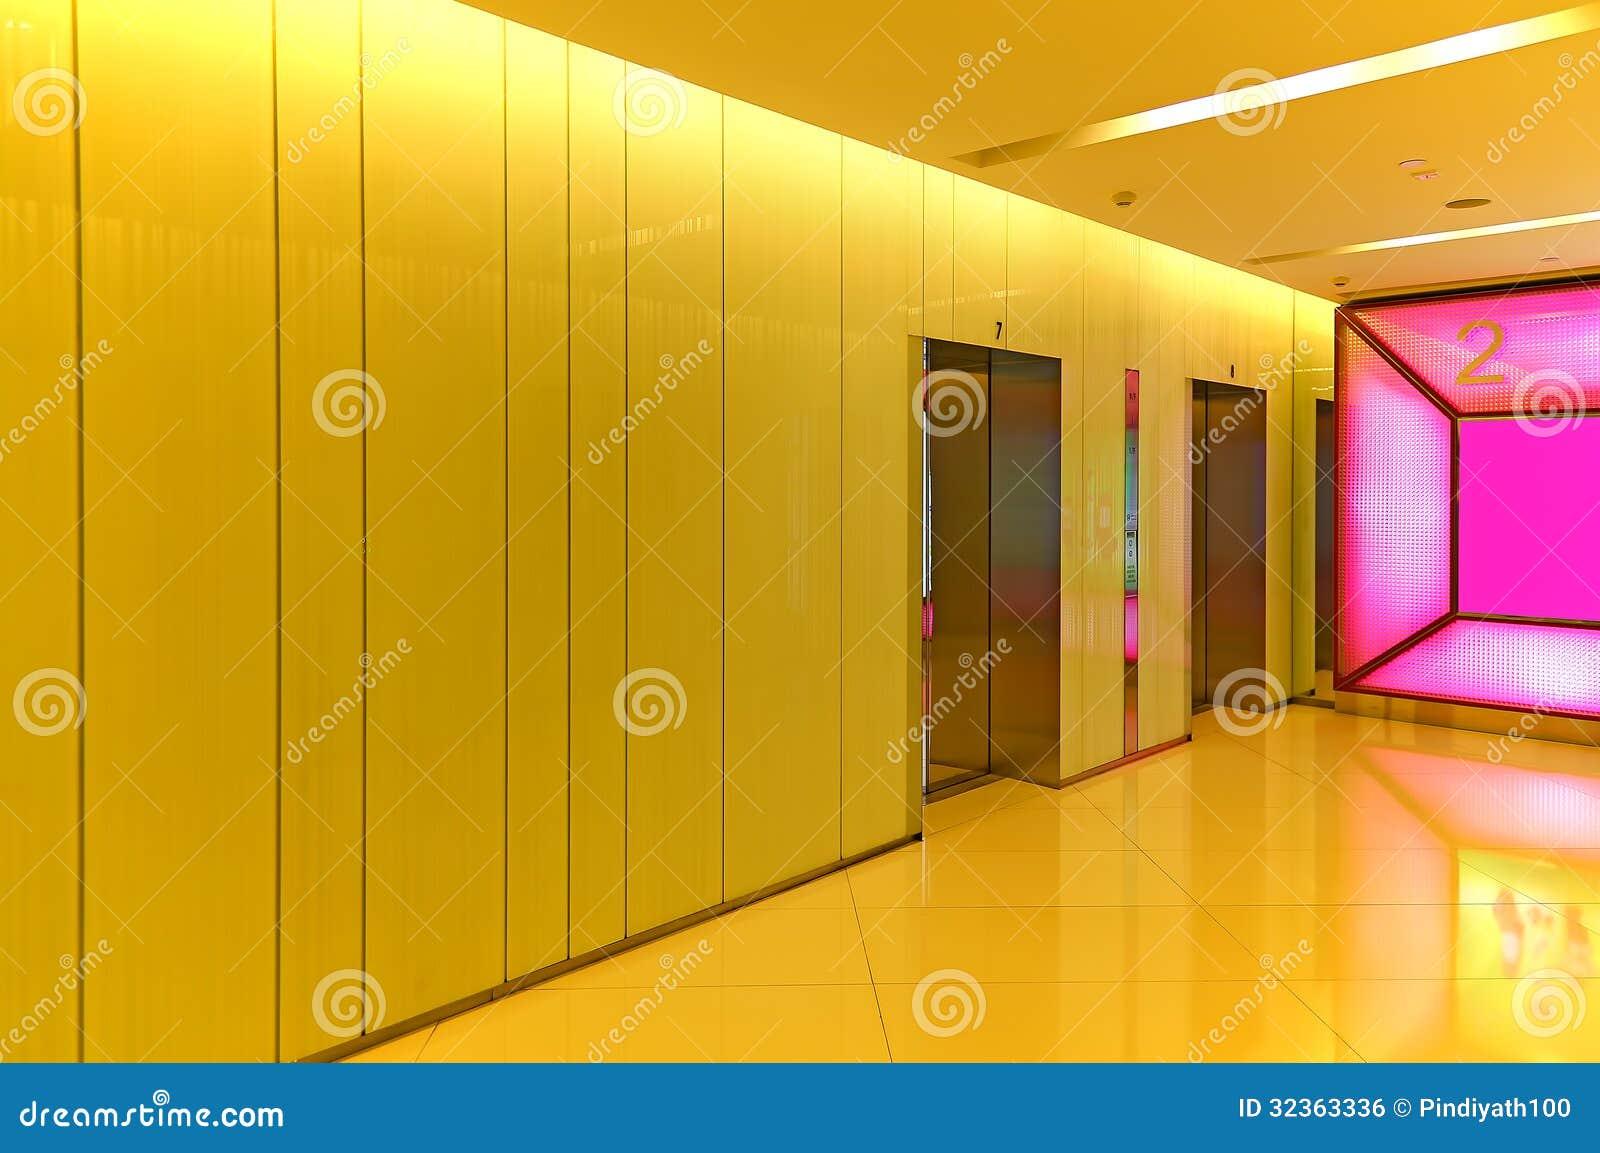 Elevator Or Lift Lobby Royalty Free Stock Image Image